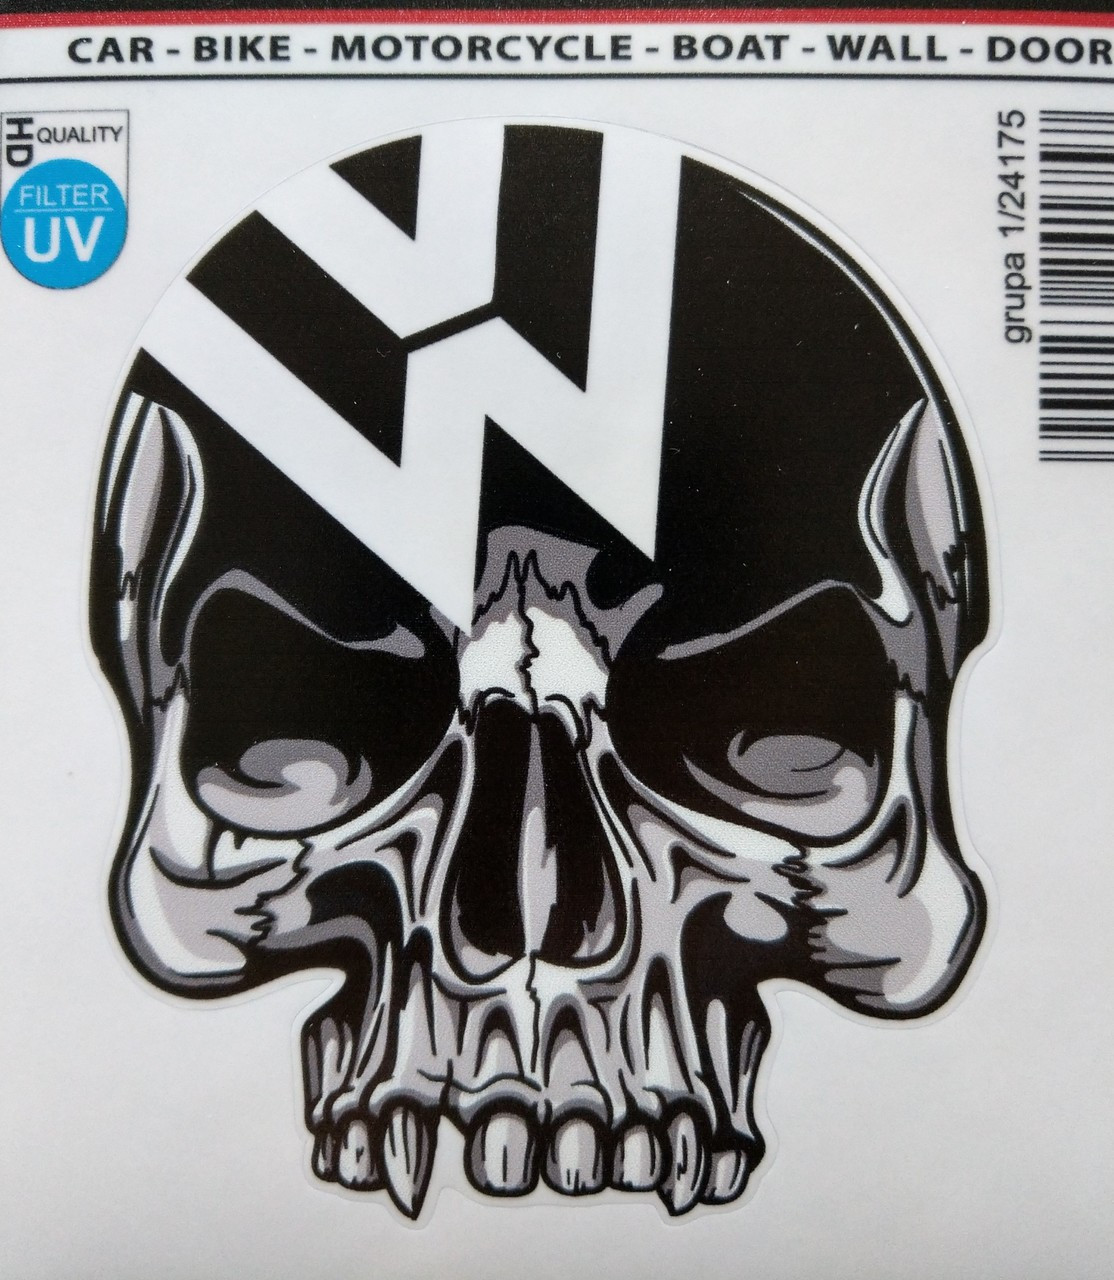 Vw skull decal 1 24175